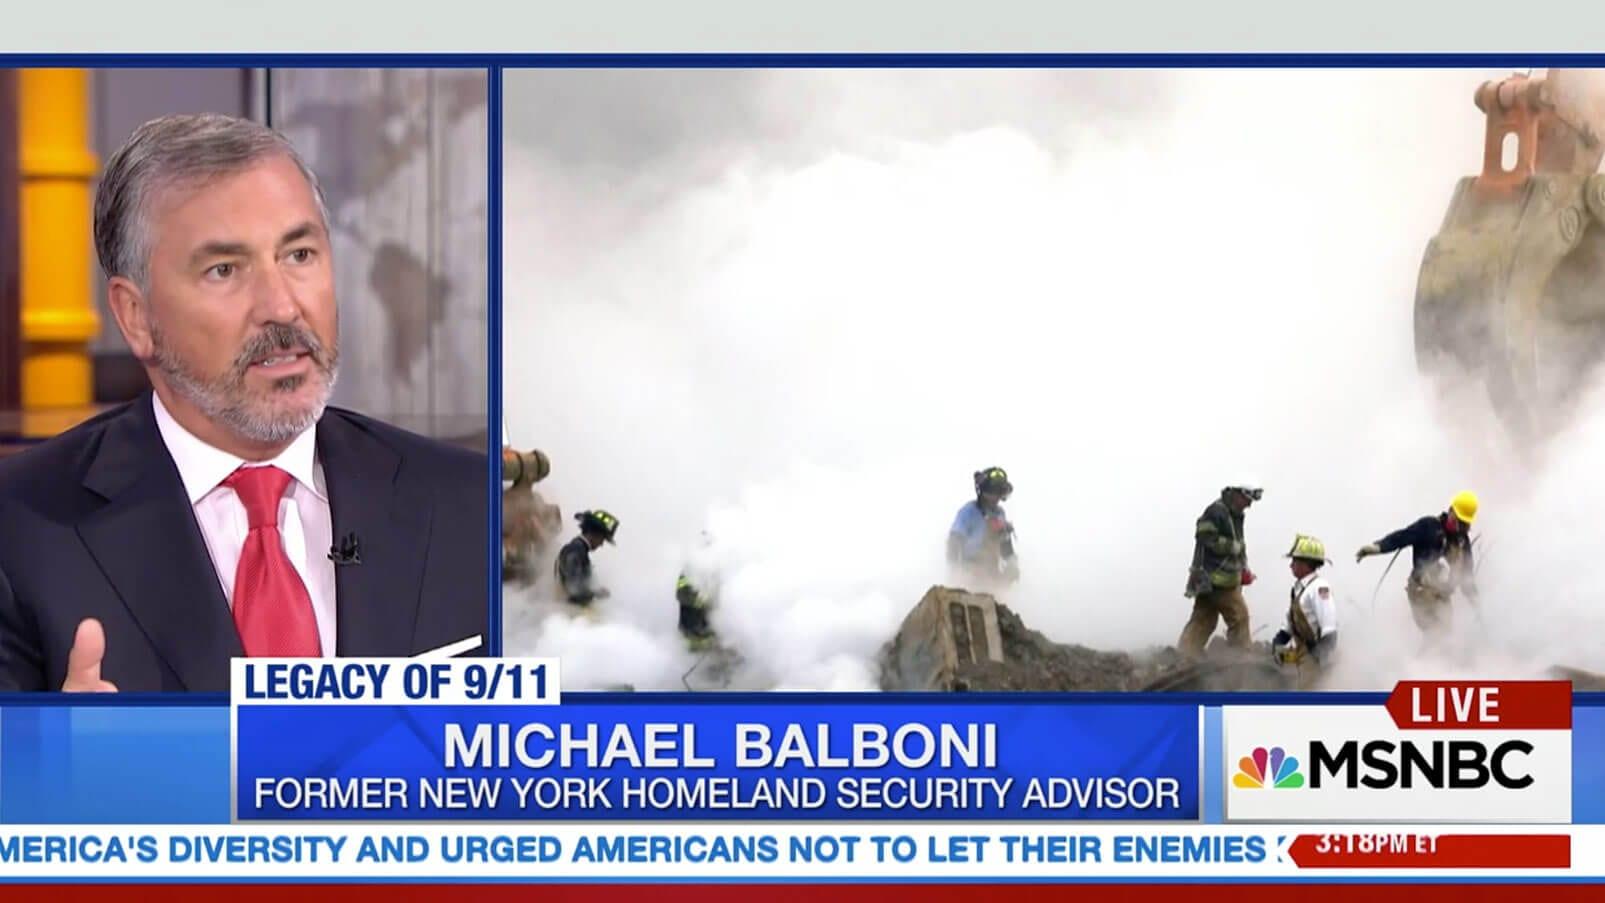 MSNBC 09-11-16